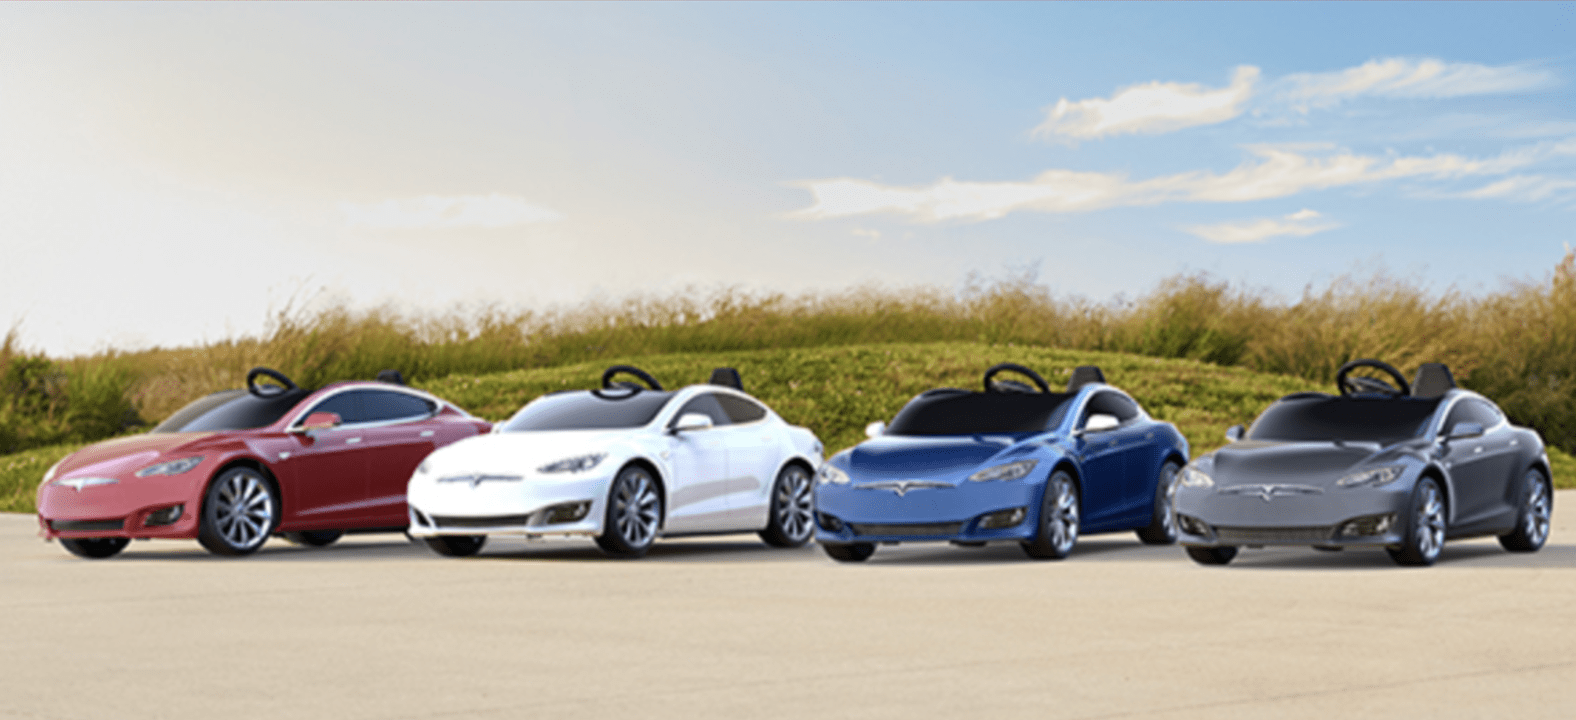 Tesla Is Working On A Tesla Minicar Says Elon Musk Electrek - Show me pictures of a tesla car